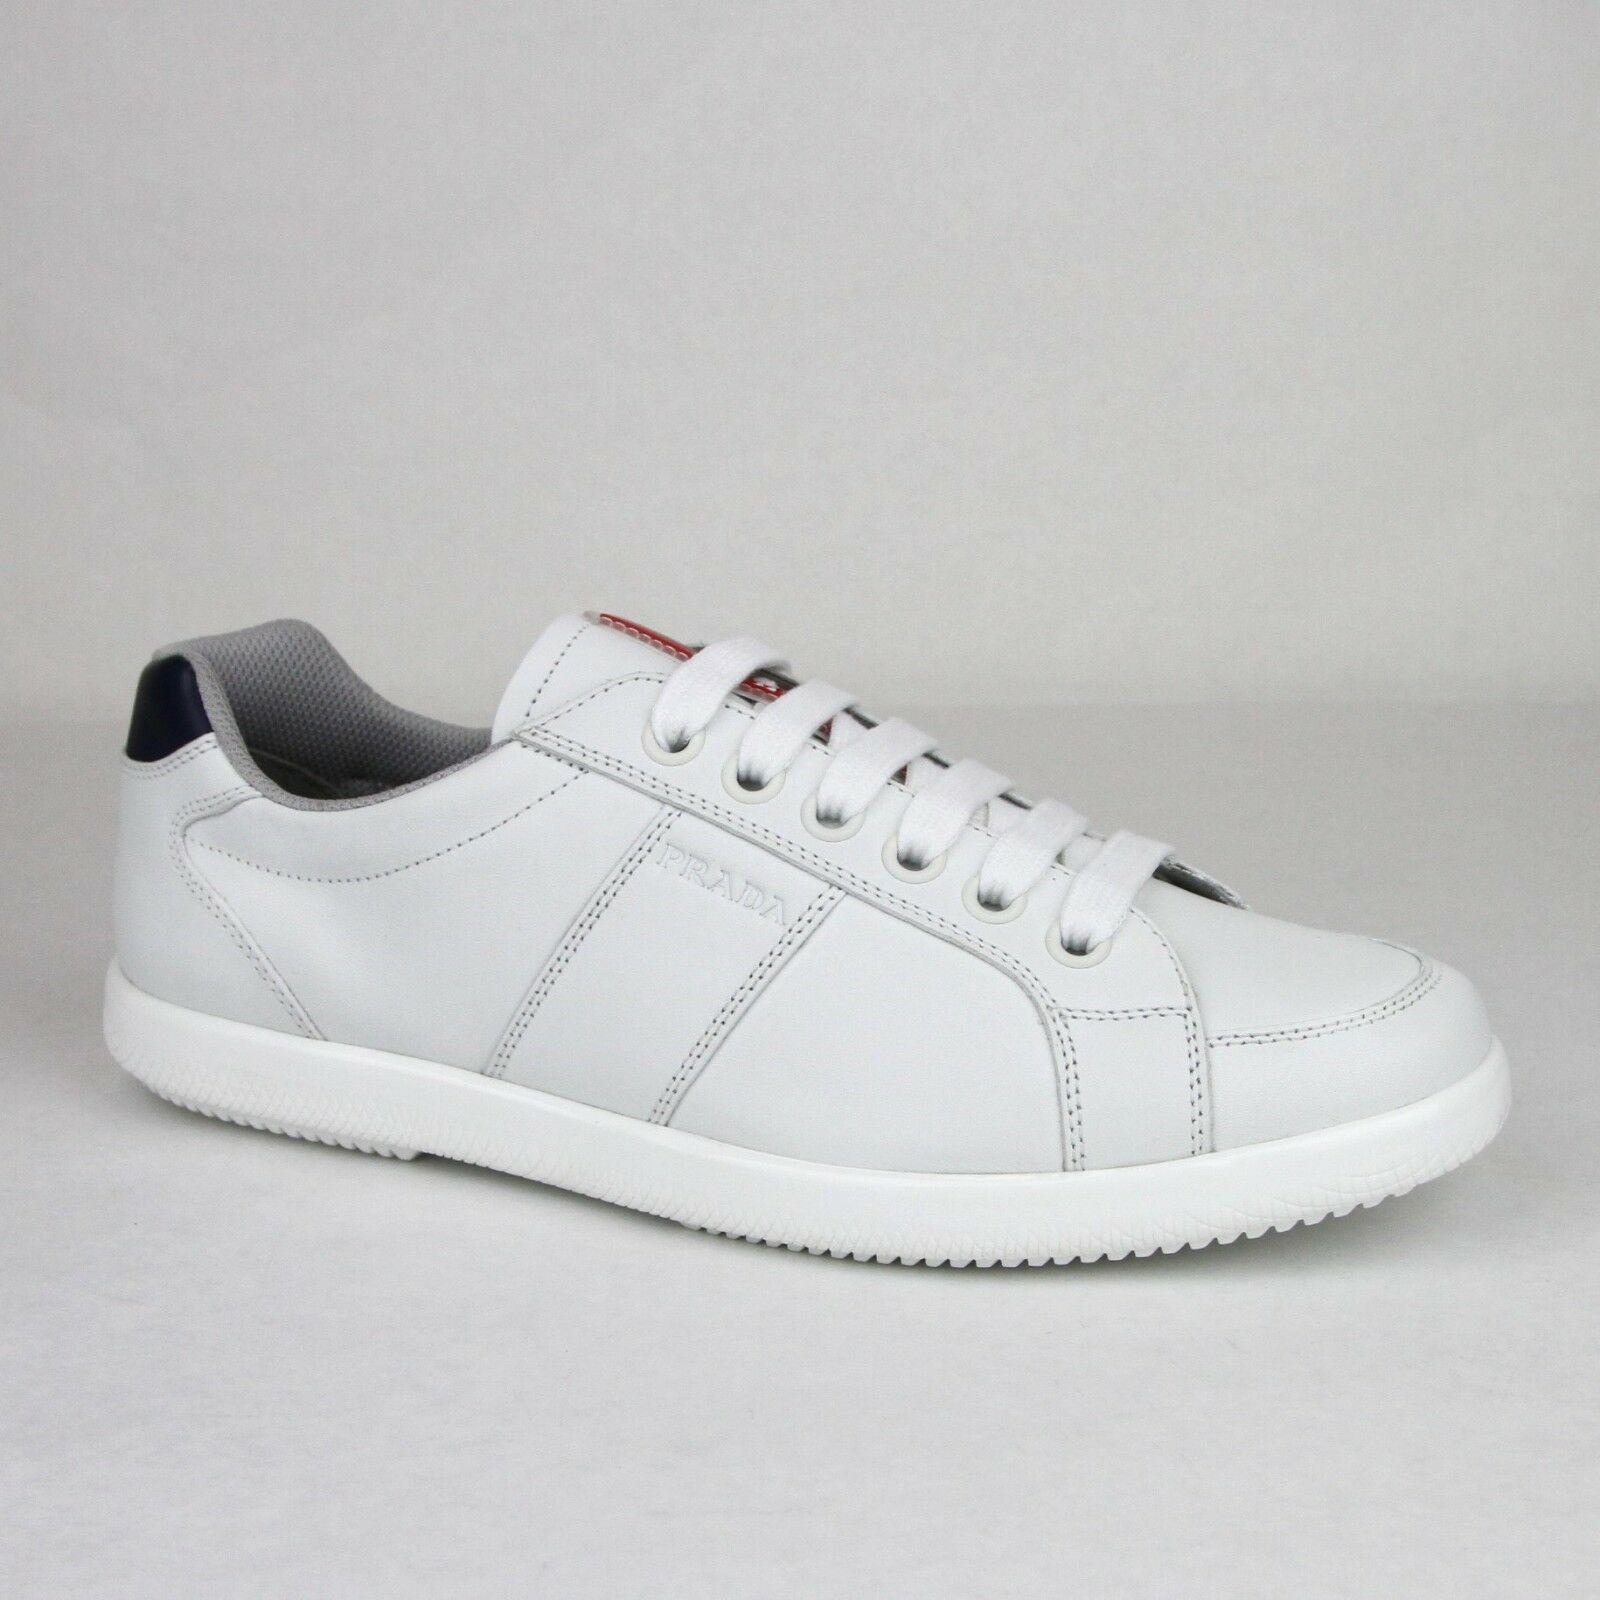 1019567b New Prada White 4E2845 Imprint Logo with Sneaker Leather Navy Men's ...